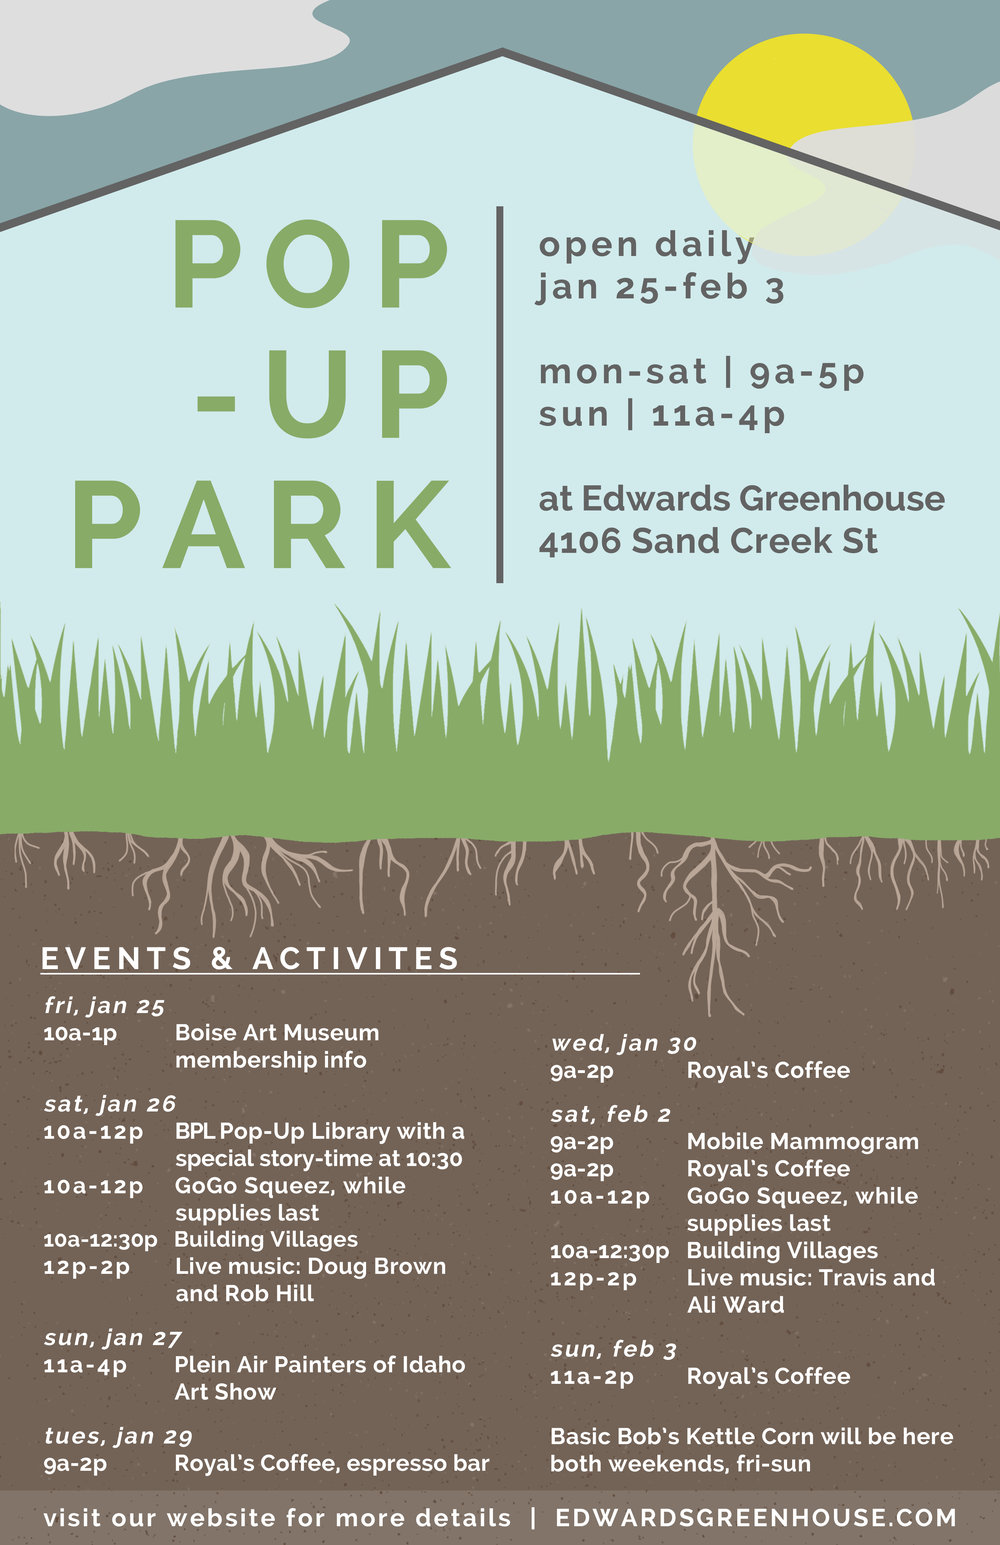 Pop-Up Park 2019 events.jpg